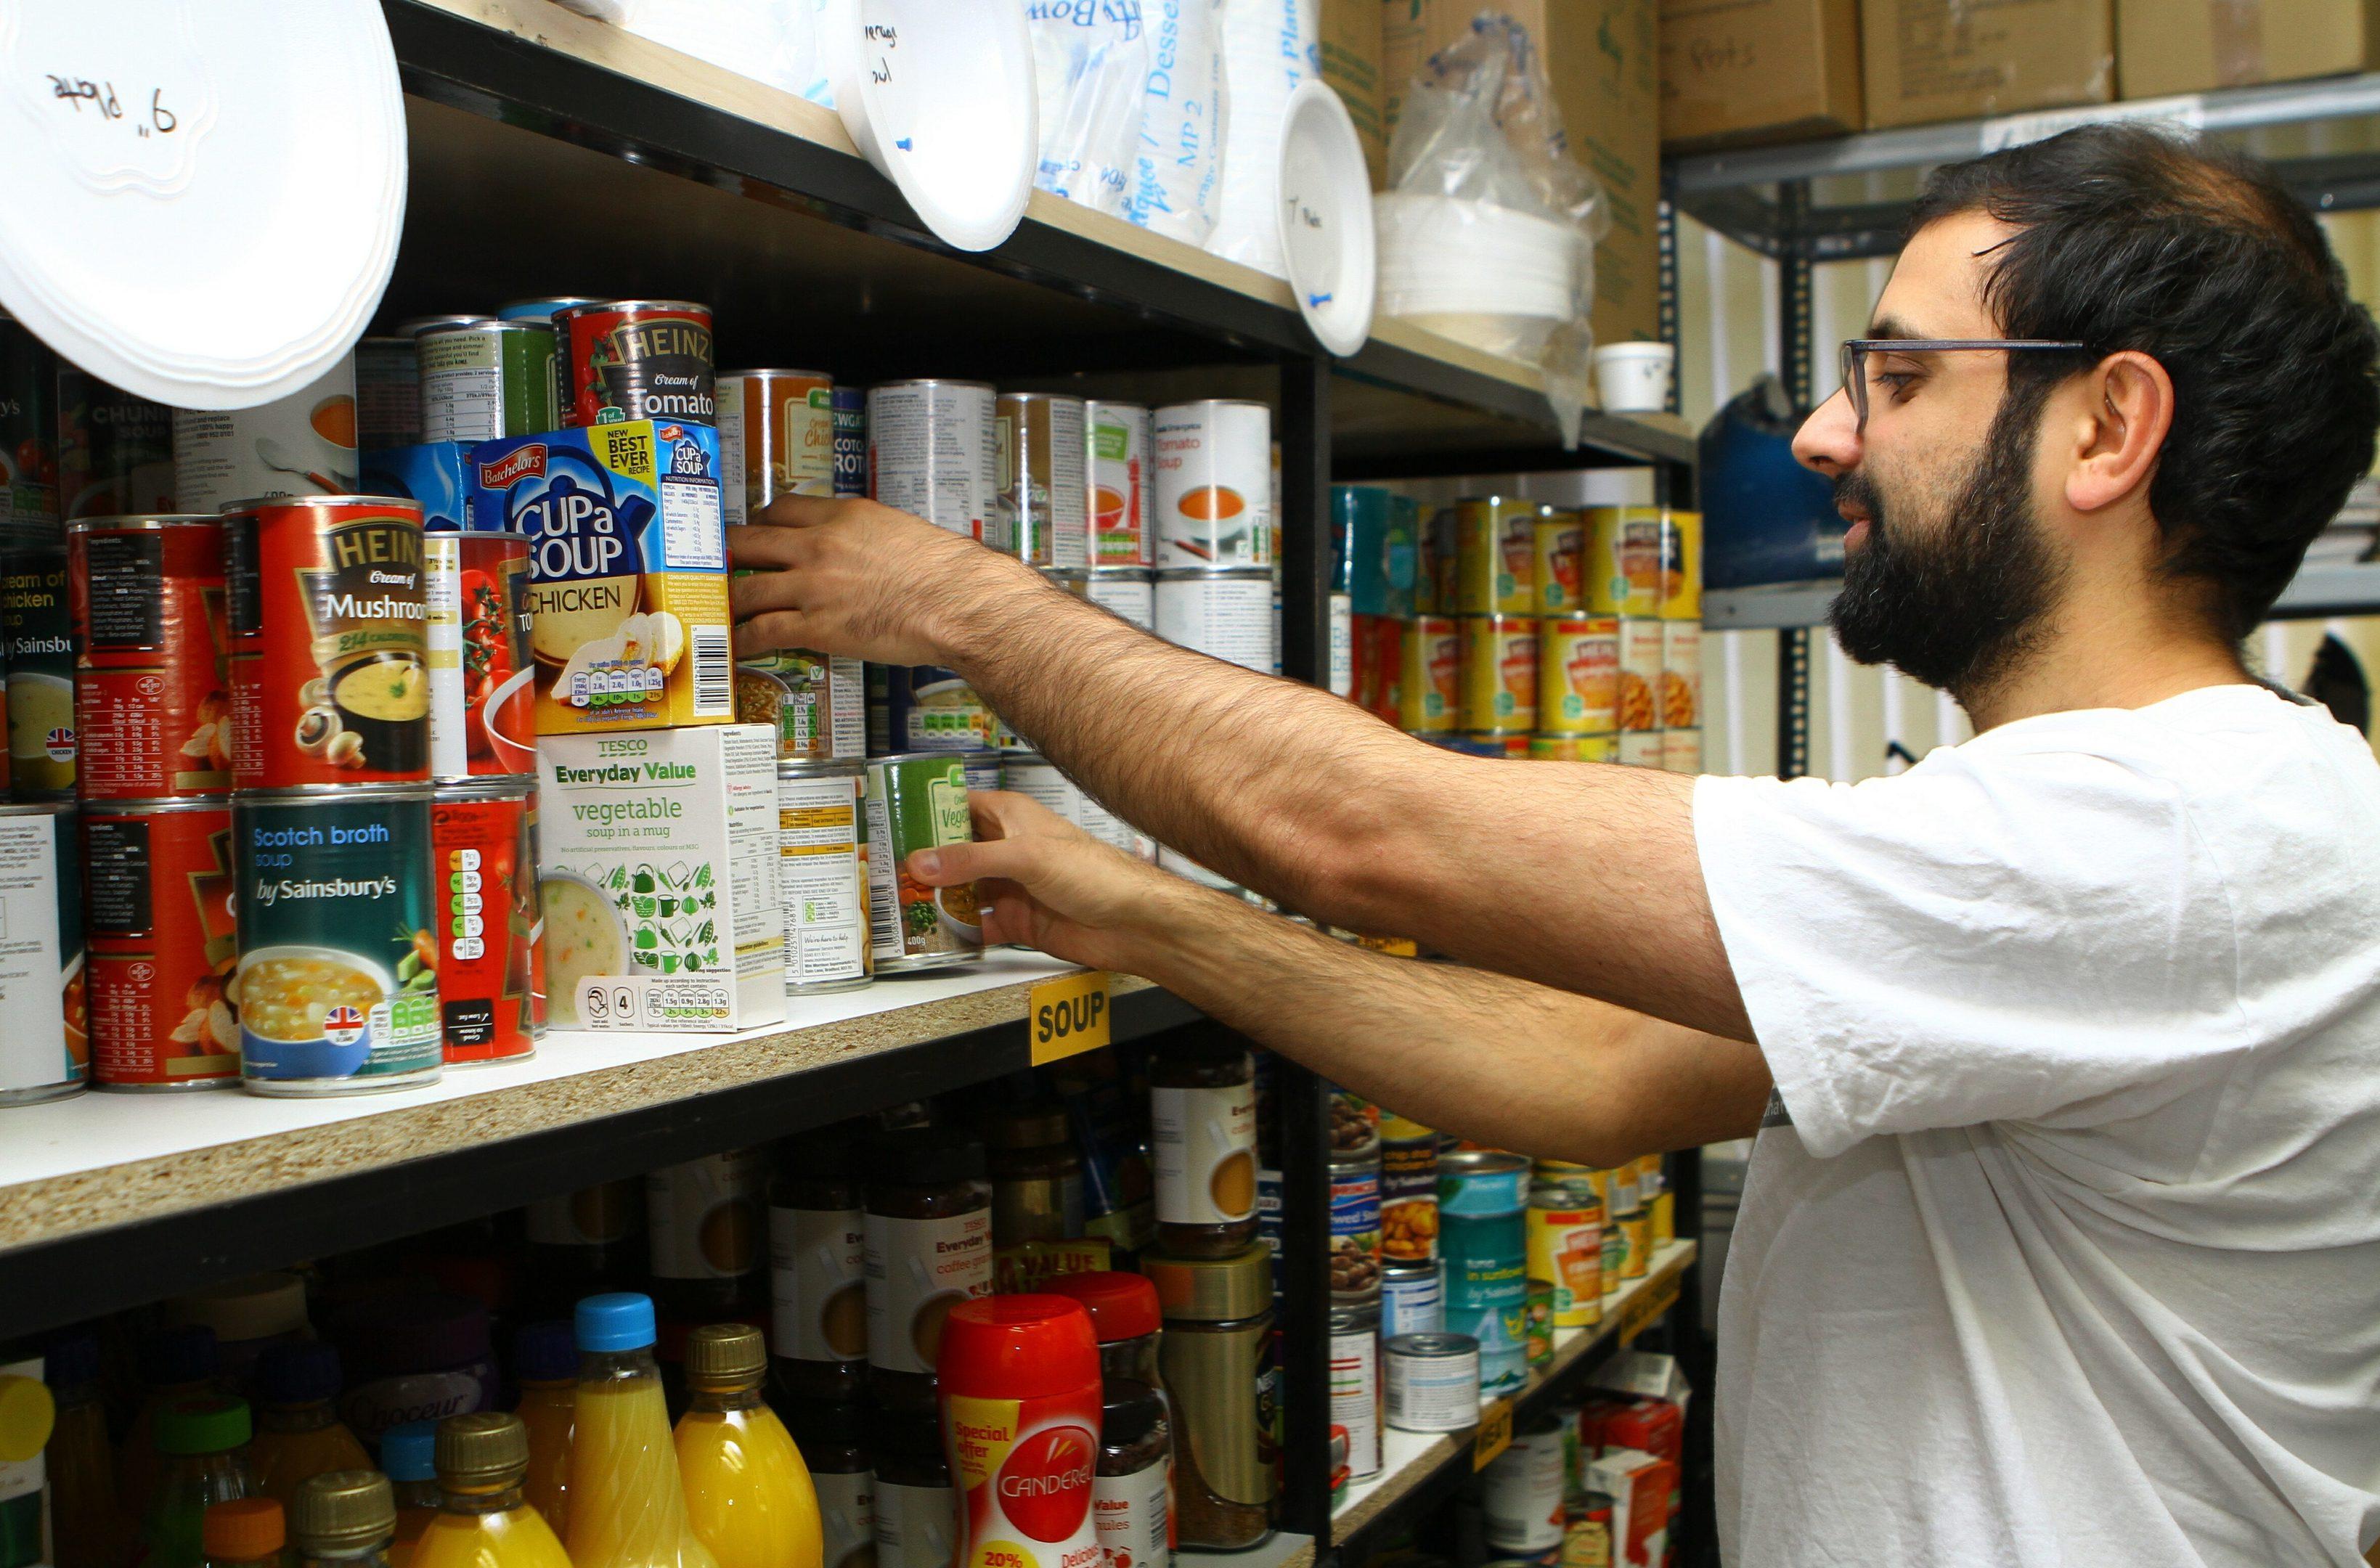 Taught By Muhammed foodbank project co-ordinator Rizwan Rafik